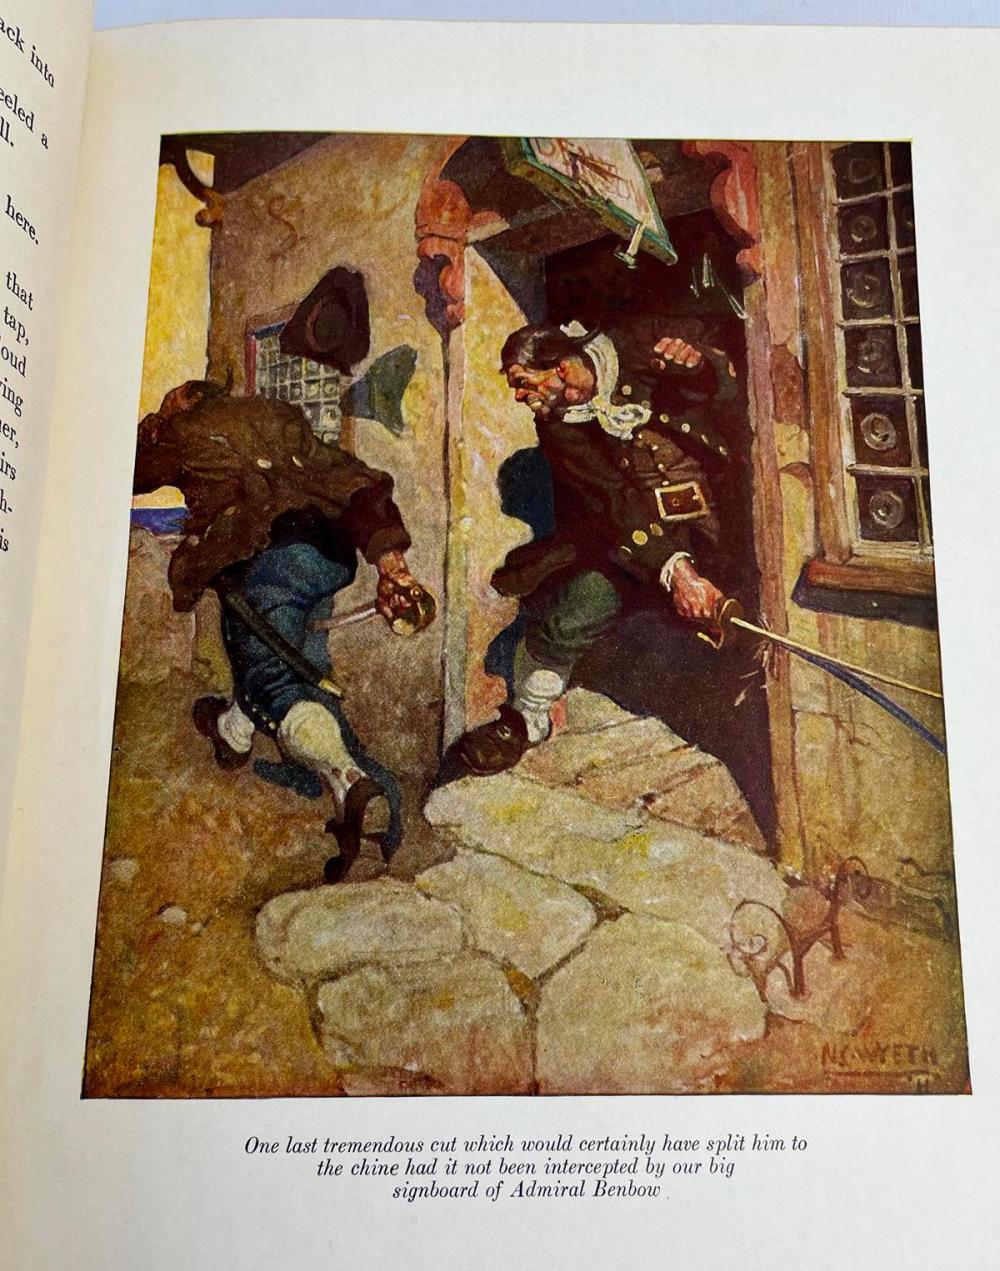 1931 Treasure Island by Robert Louis Stevenson ILLUSTRATED by N.C. Wyeth